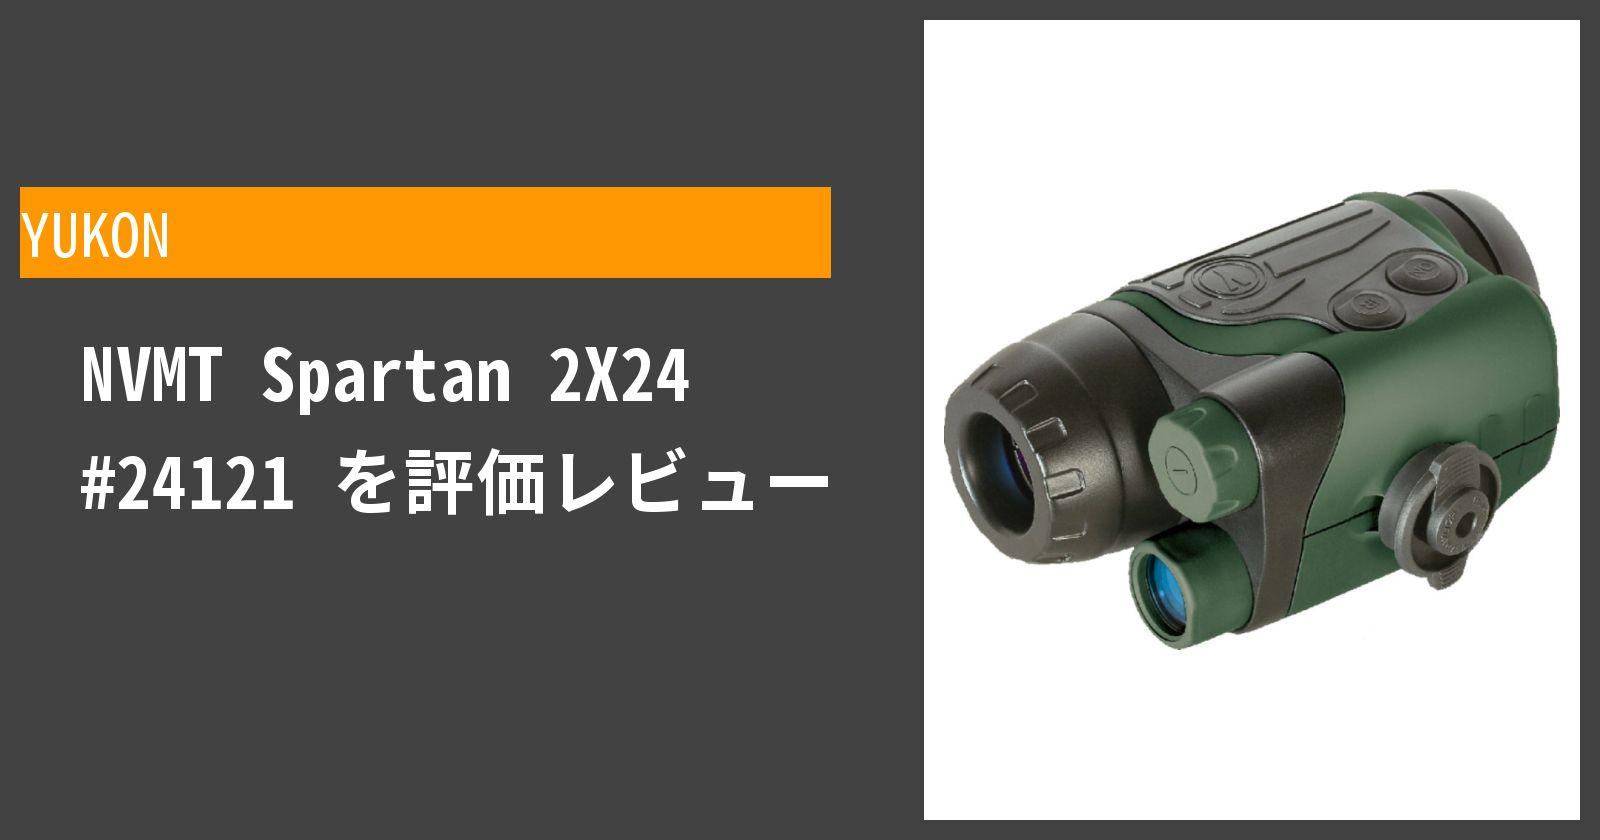 NVMT Spartan 2X24 #24121を徹底評価